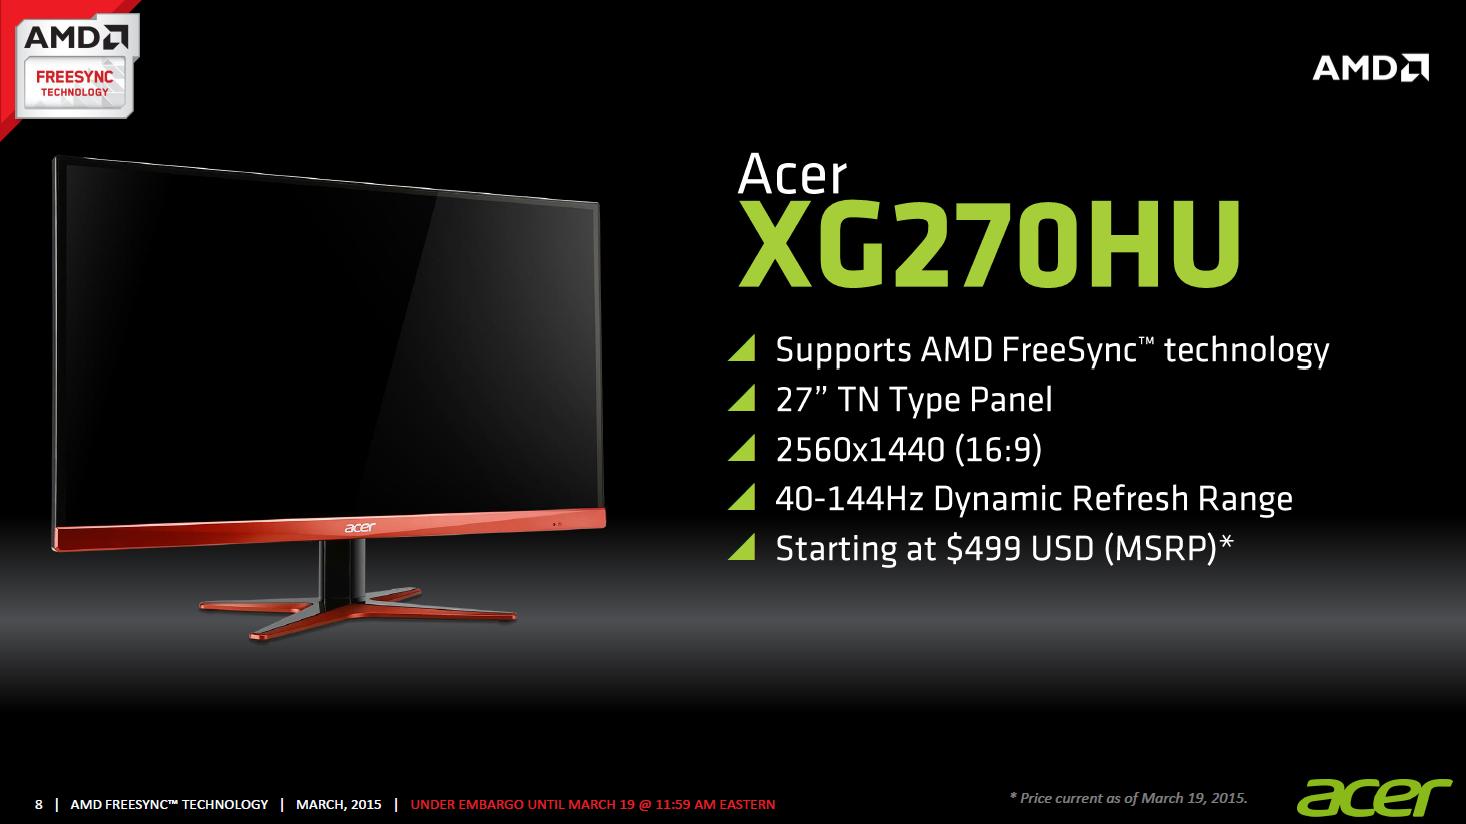 AMD Freesync im Test: Kostenlos im gleichen Takt - Acer XG270HU (Bild: AMD)